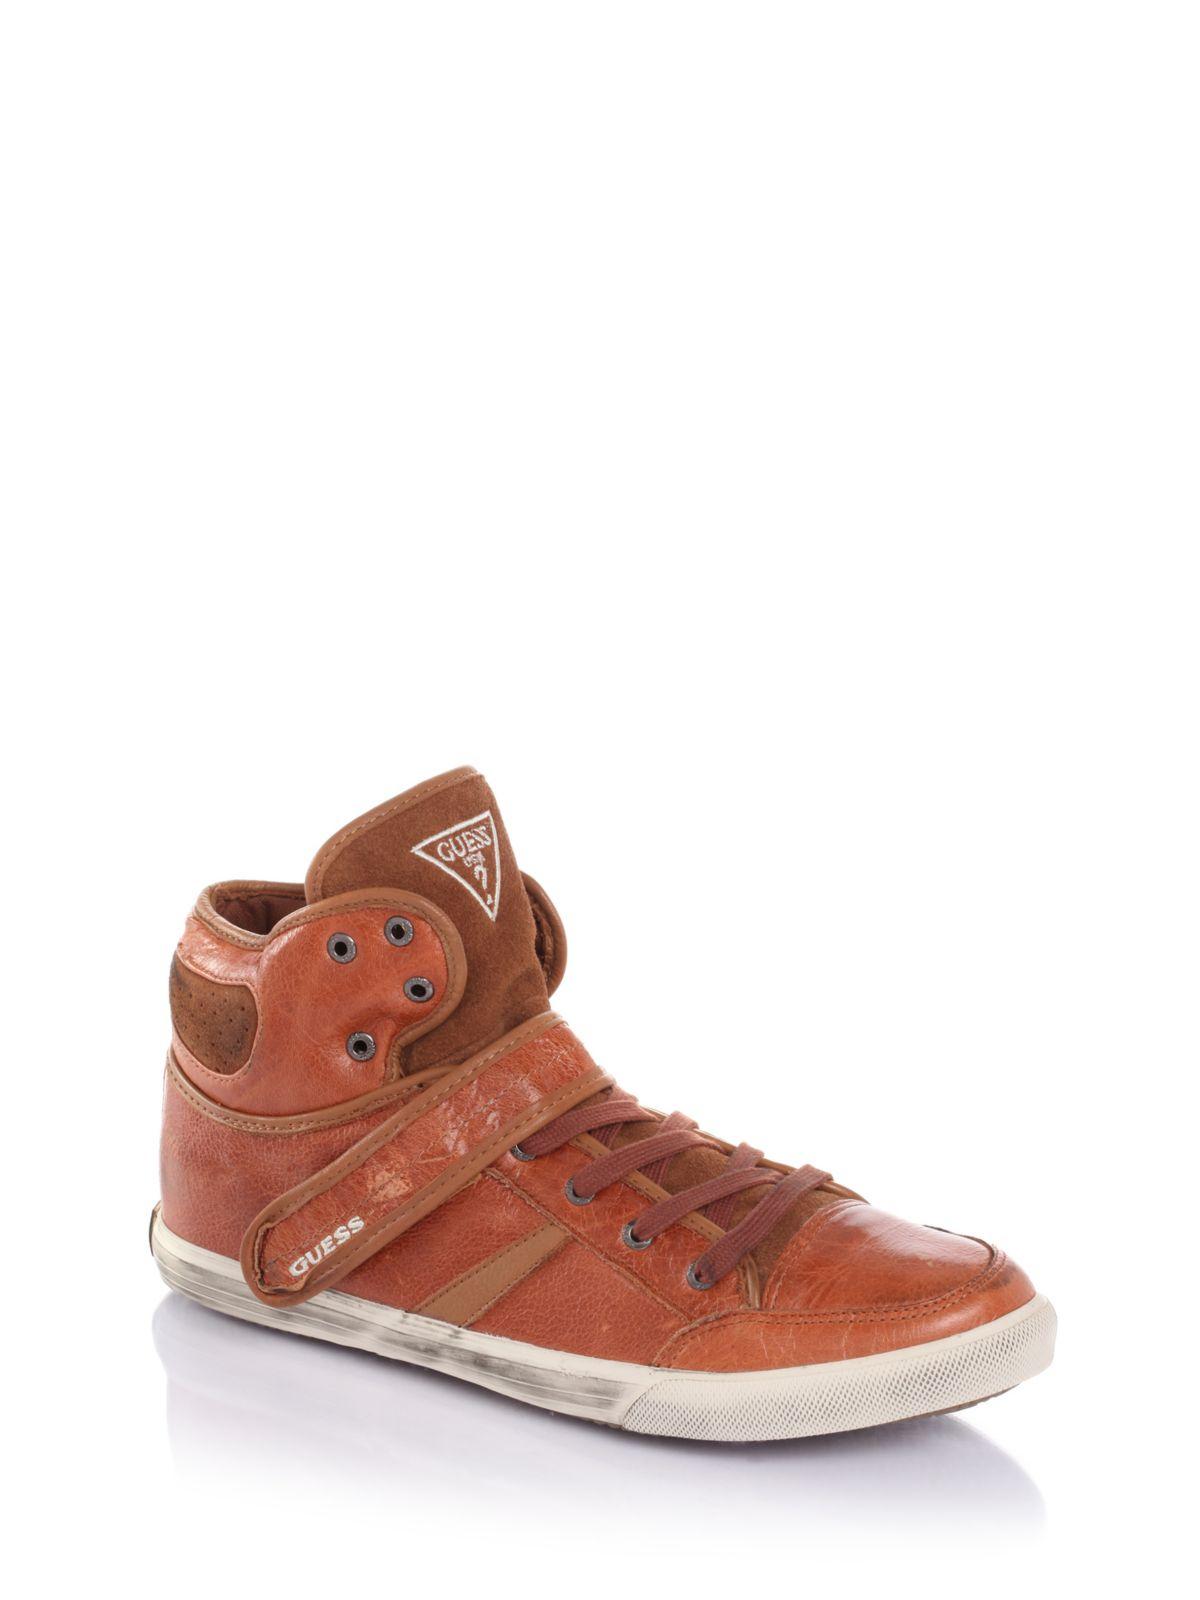 Nike Rondo Shoes